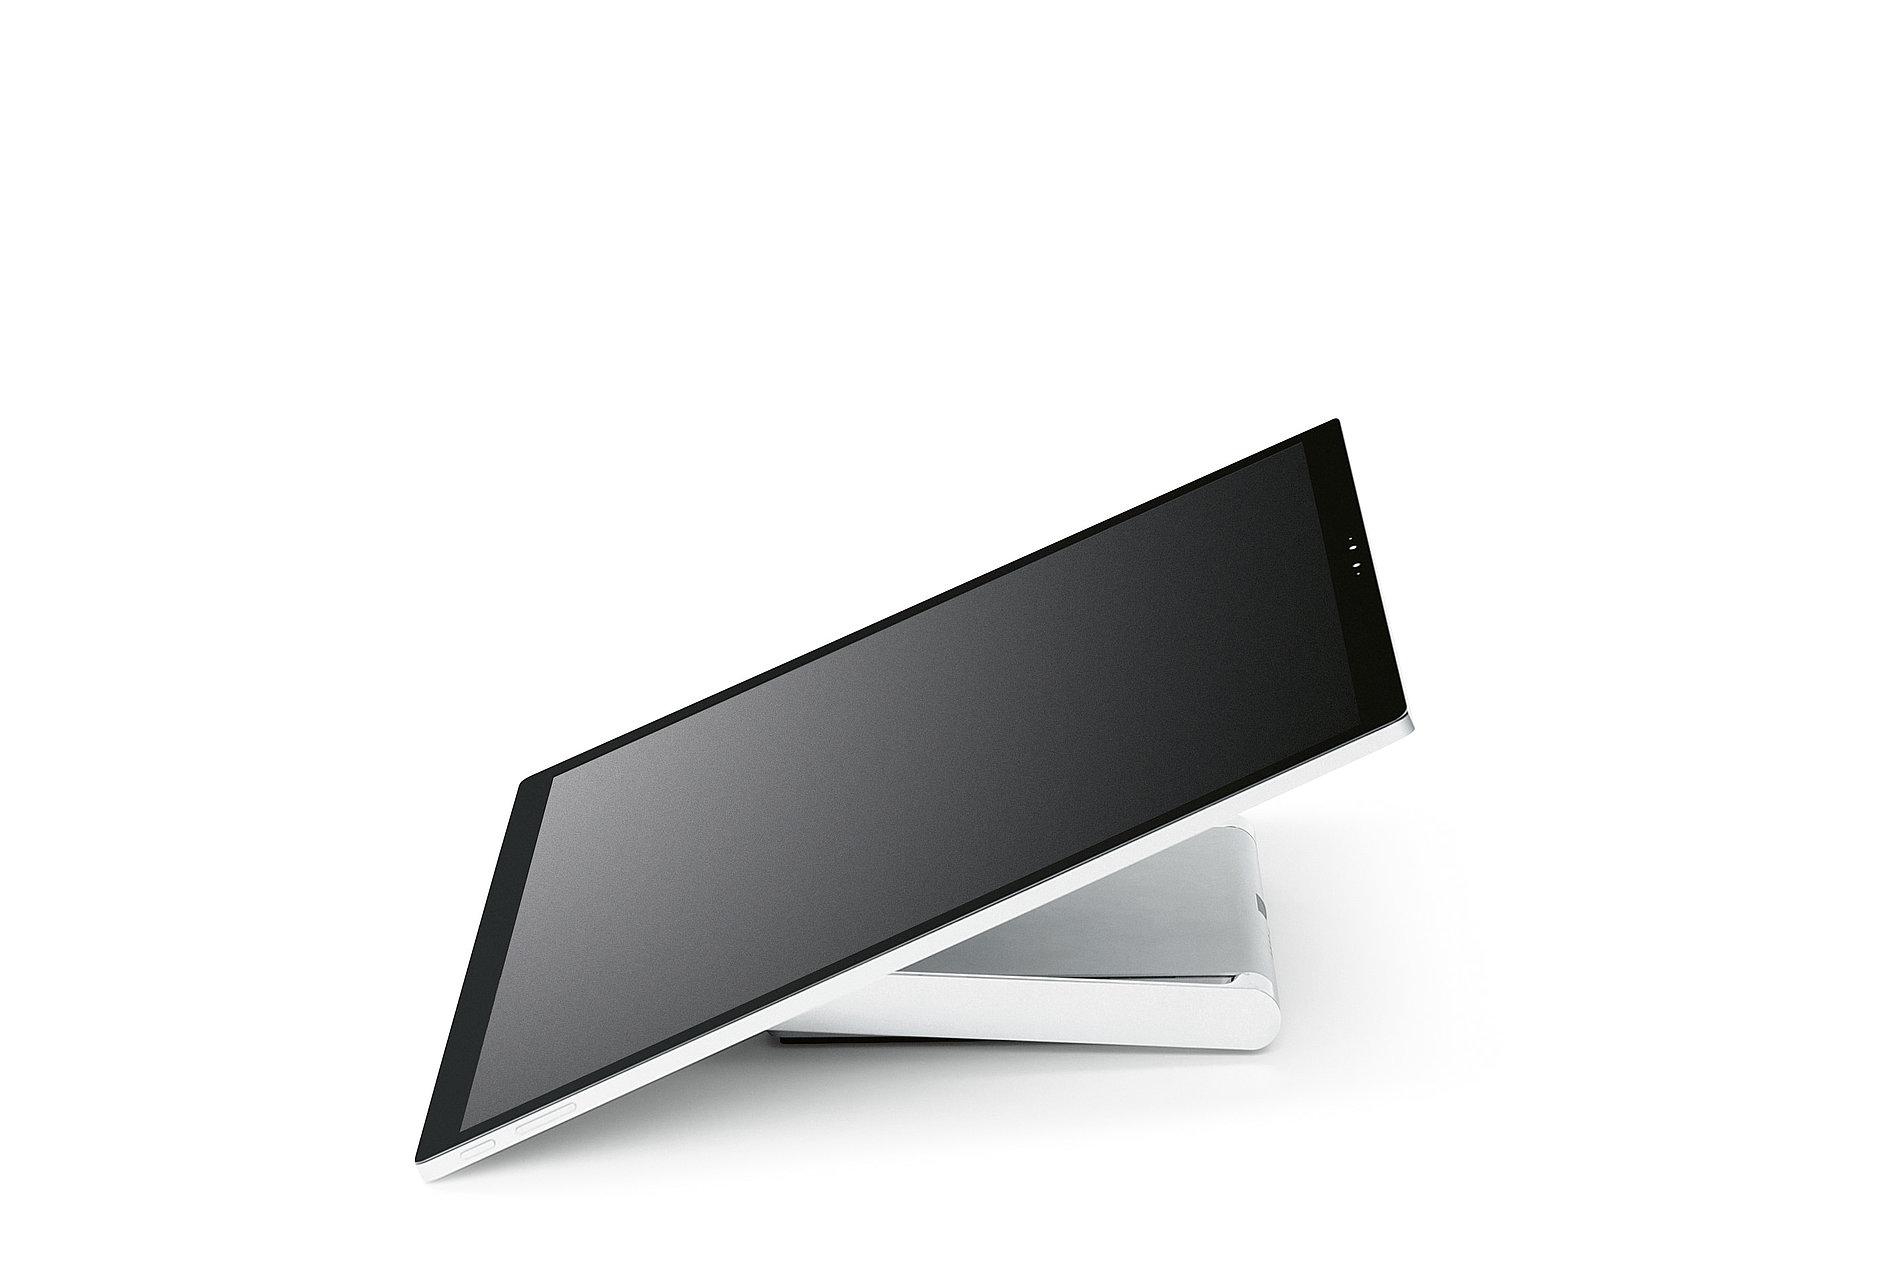 Surface Studio | Red Dot Design Award